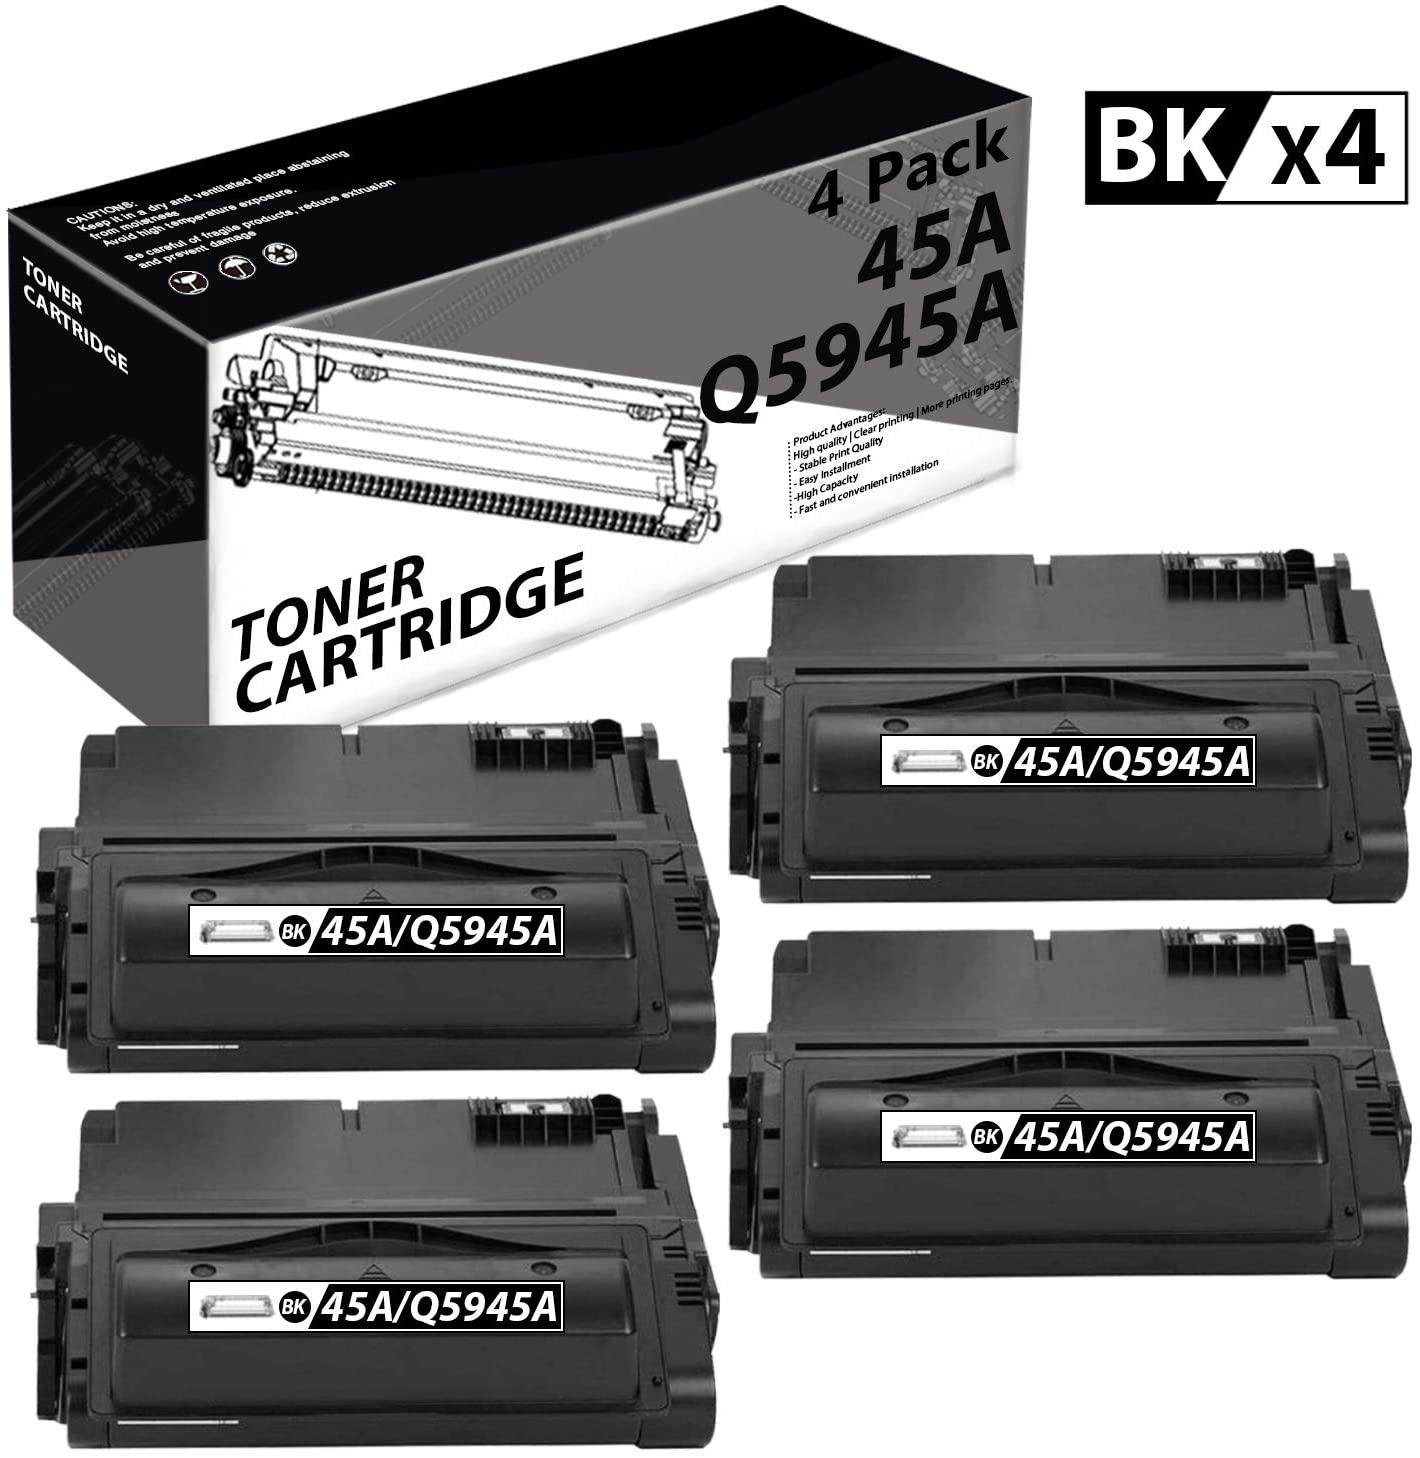 45A | Q5945A(4 Pack-Black) Compatible Toner Cartridge Replacement for HP Laserjet 4300 4300n 4200 4200N 4250 4250n 4350 4350n M4345xs M4345 MFP Laser Printers.